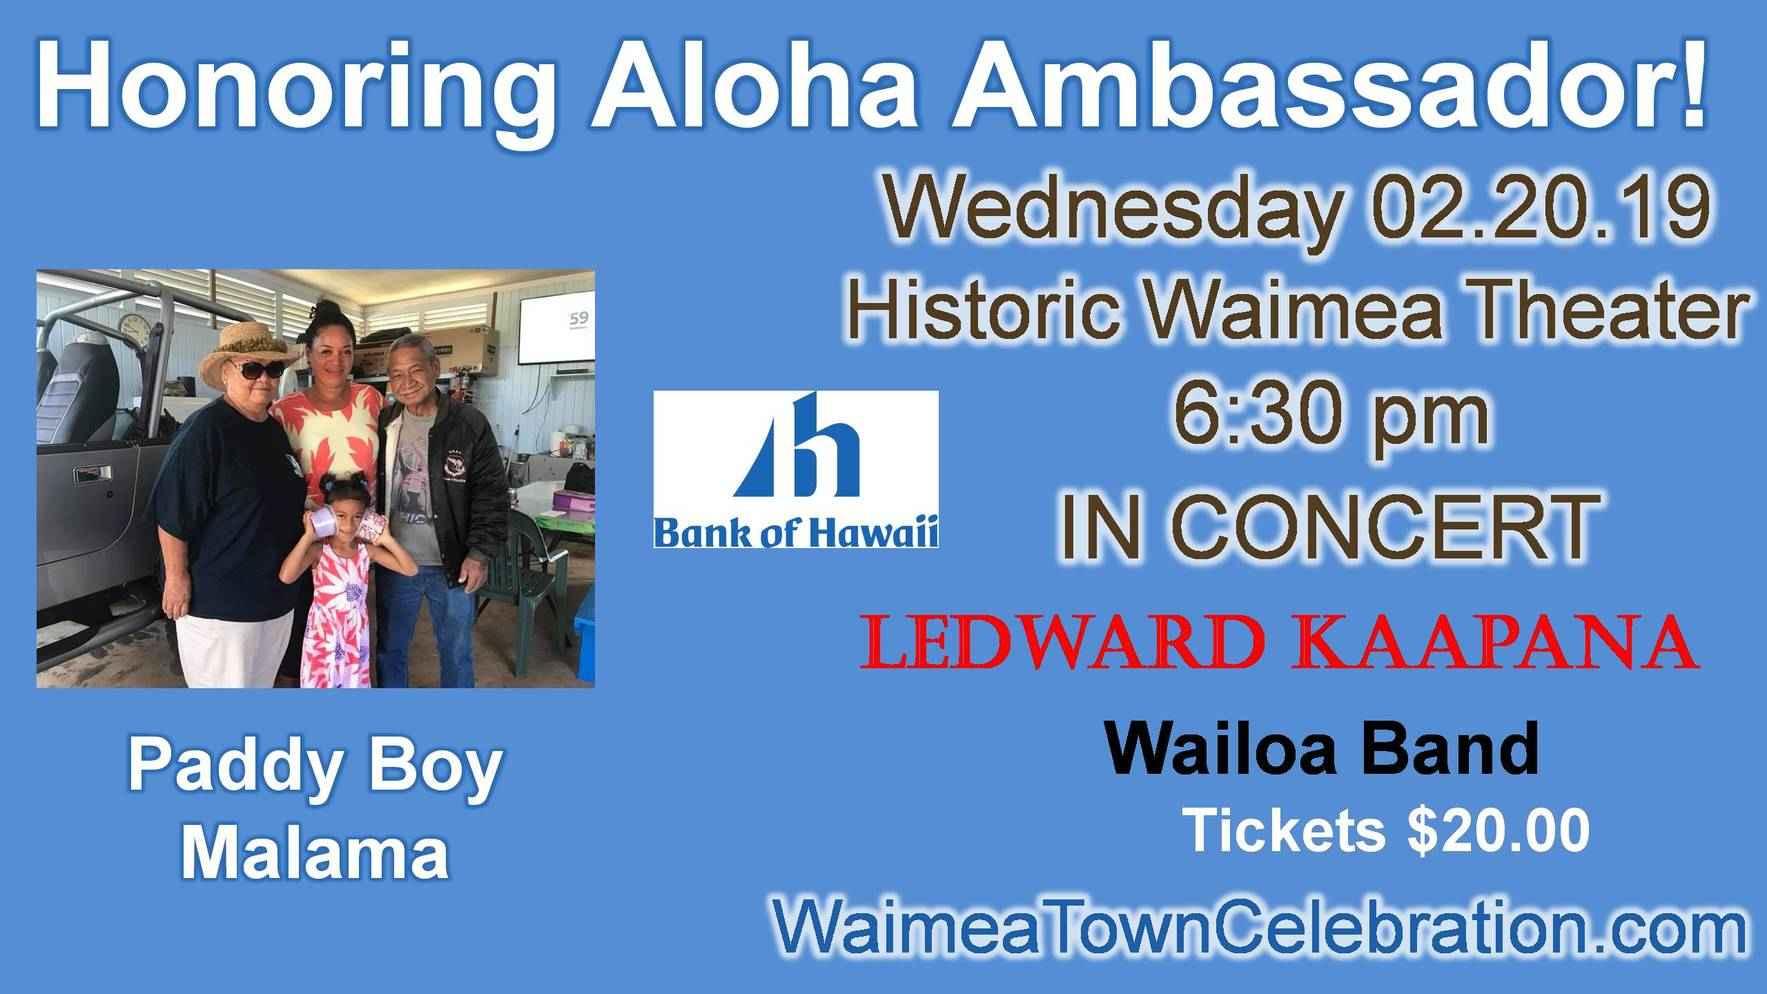 2019 Ambassador of Aloha image